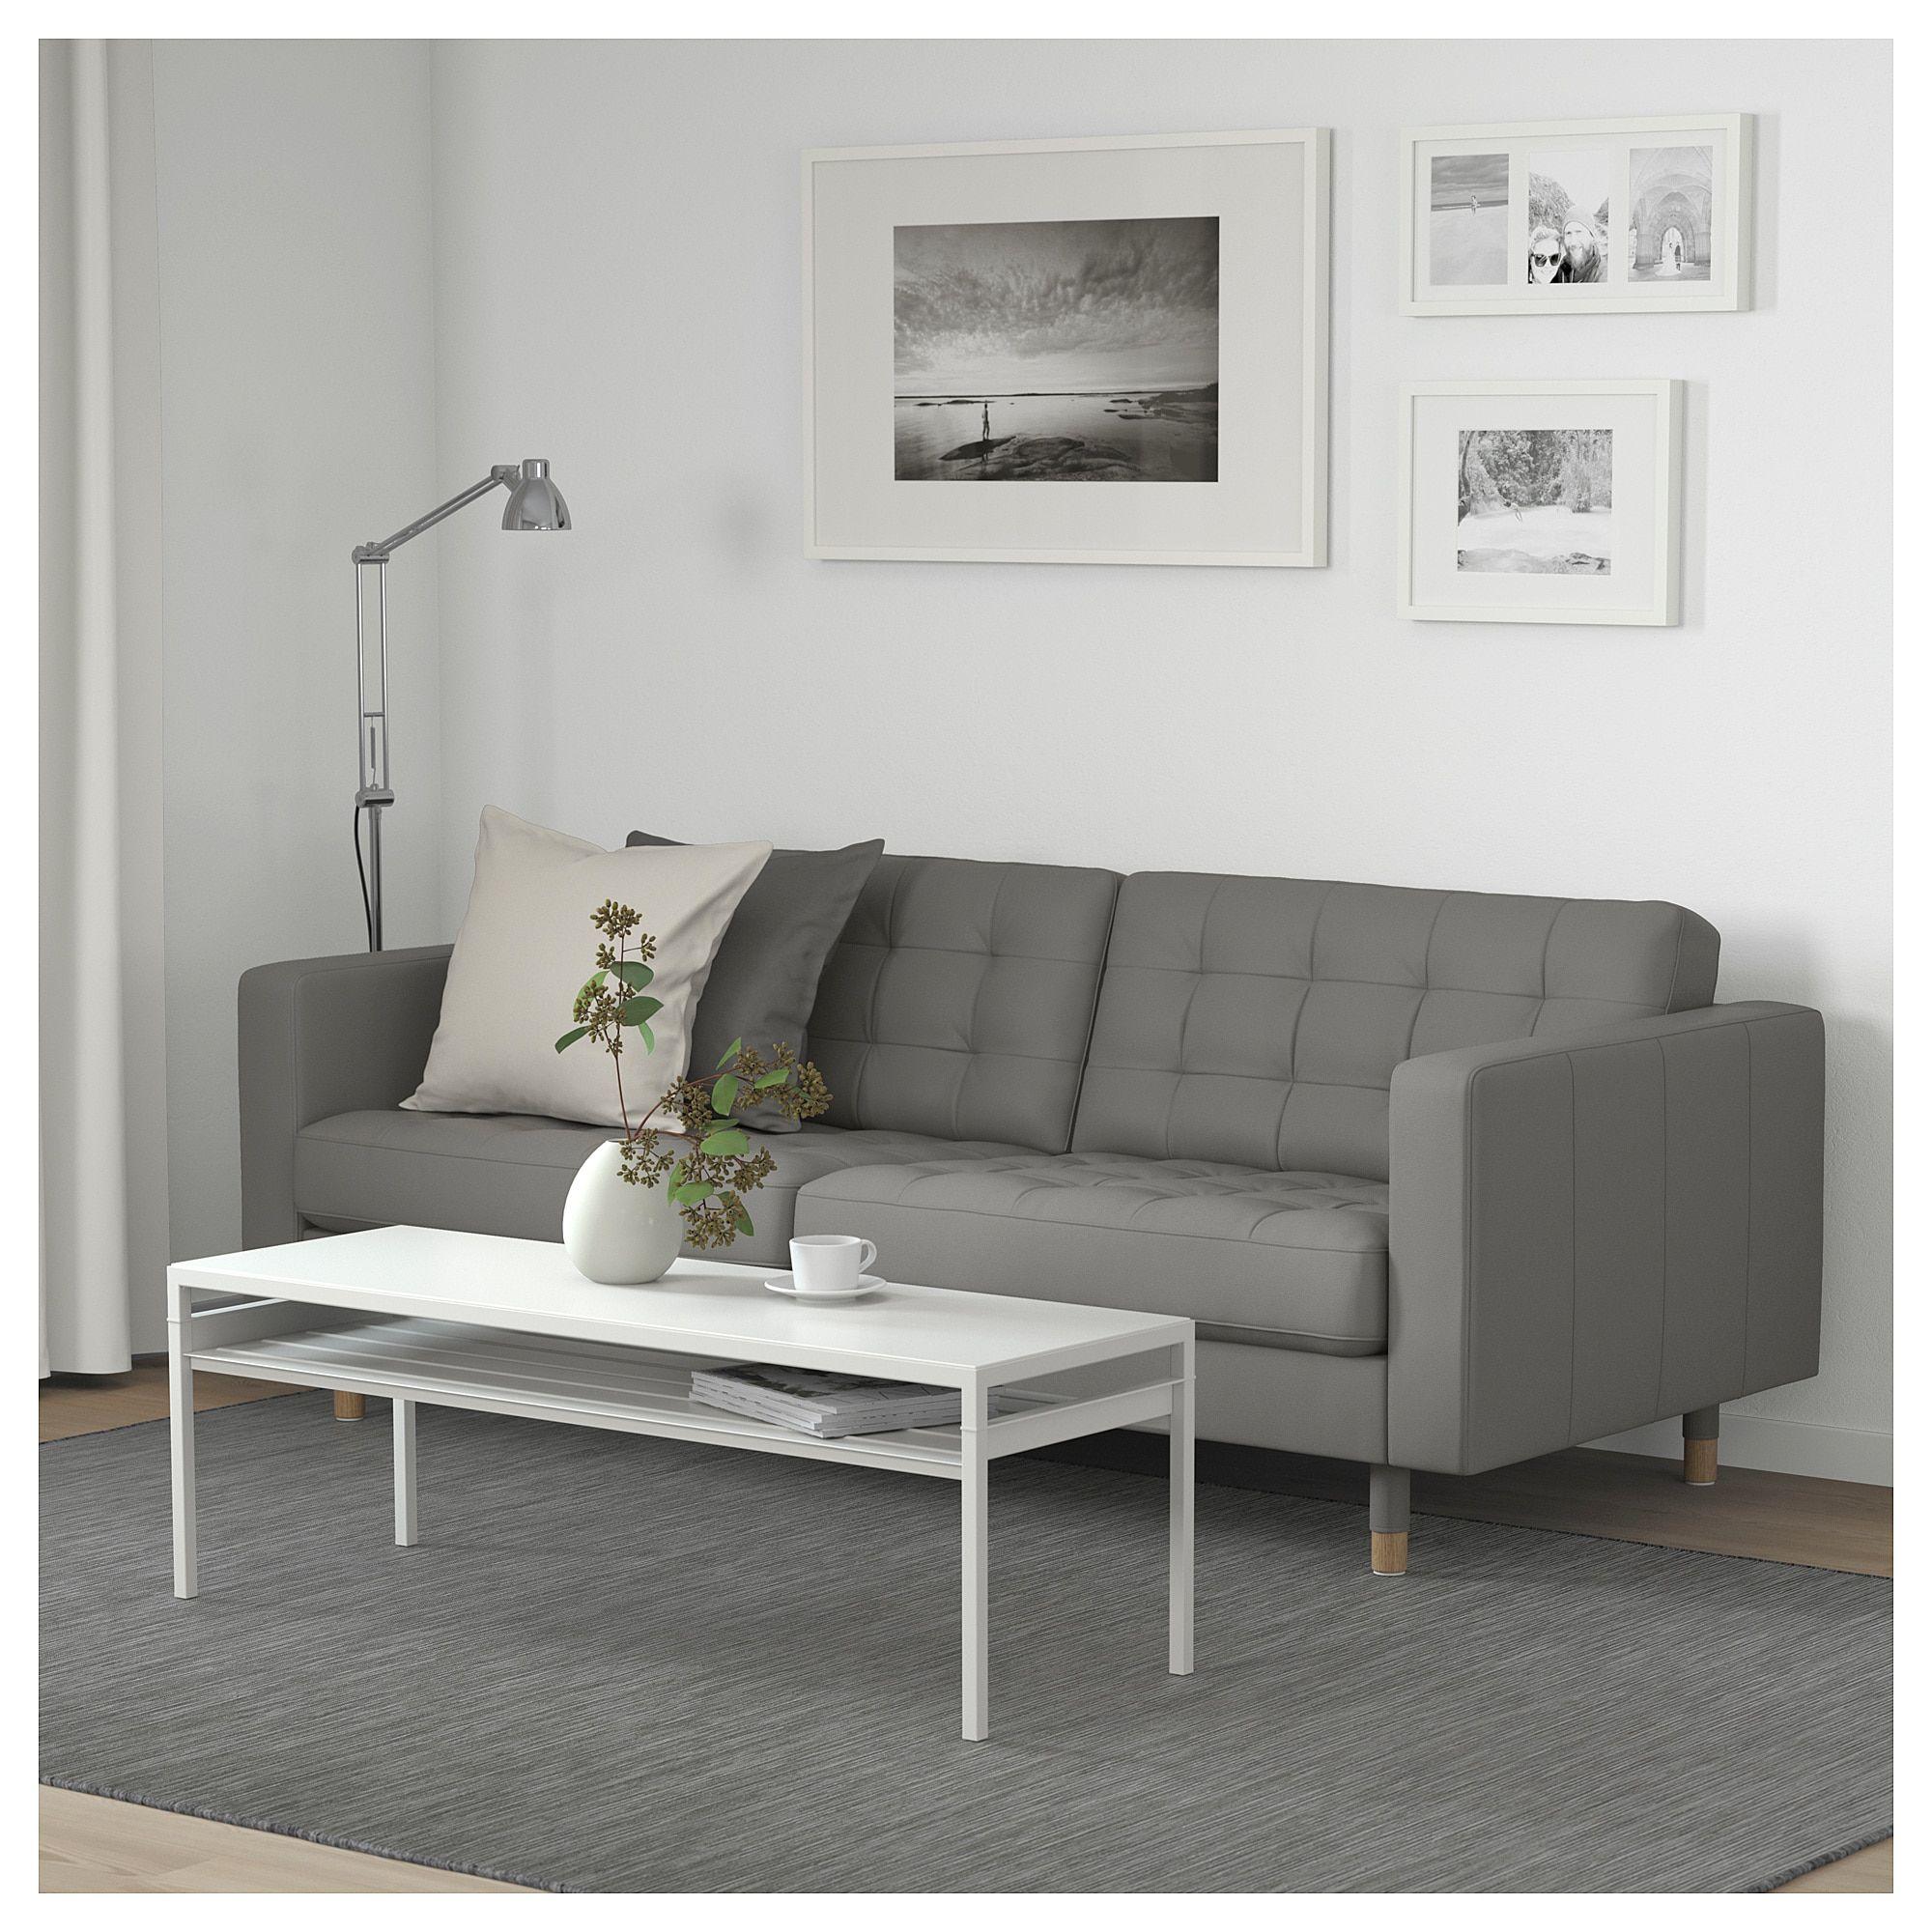 ikea landskrona sofa grann bomstad gray green wood in 2019 rh pinterest com